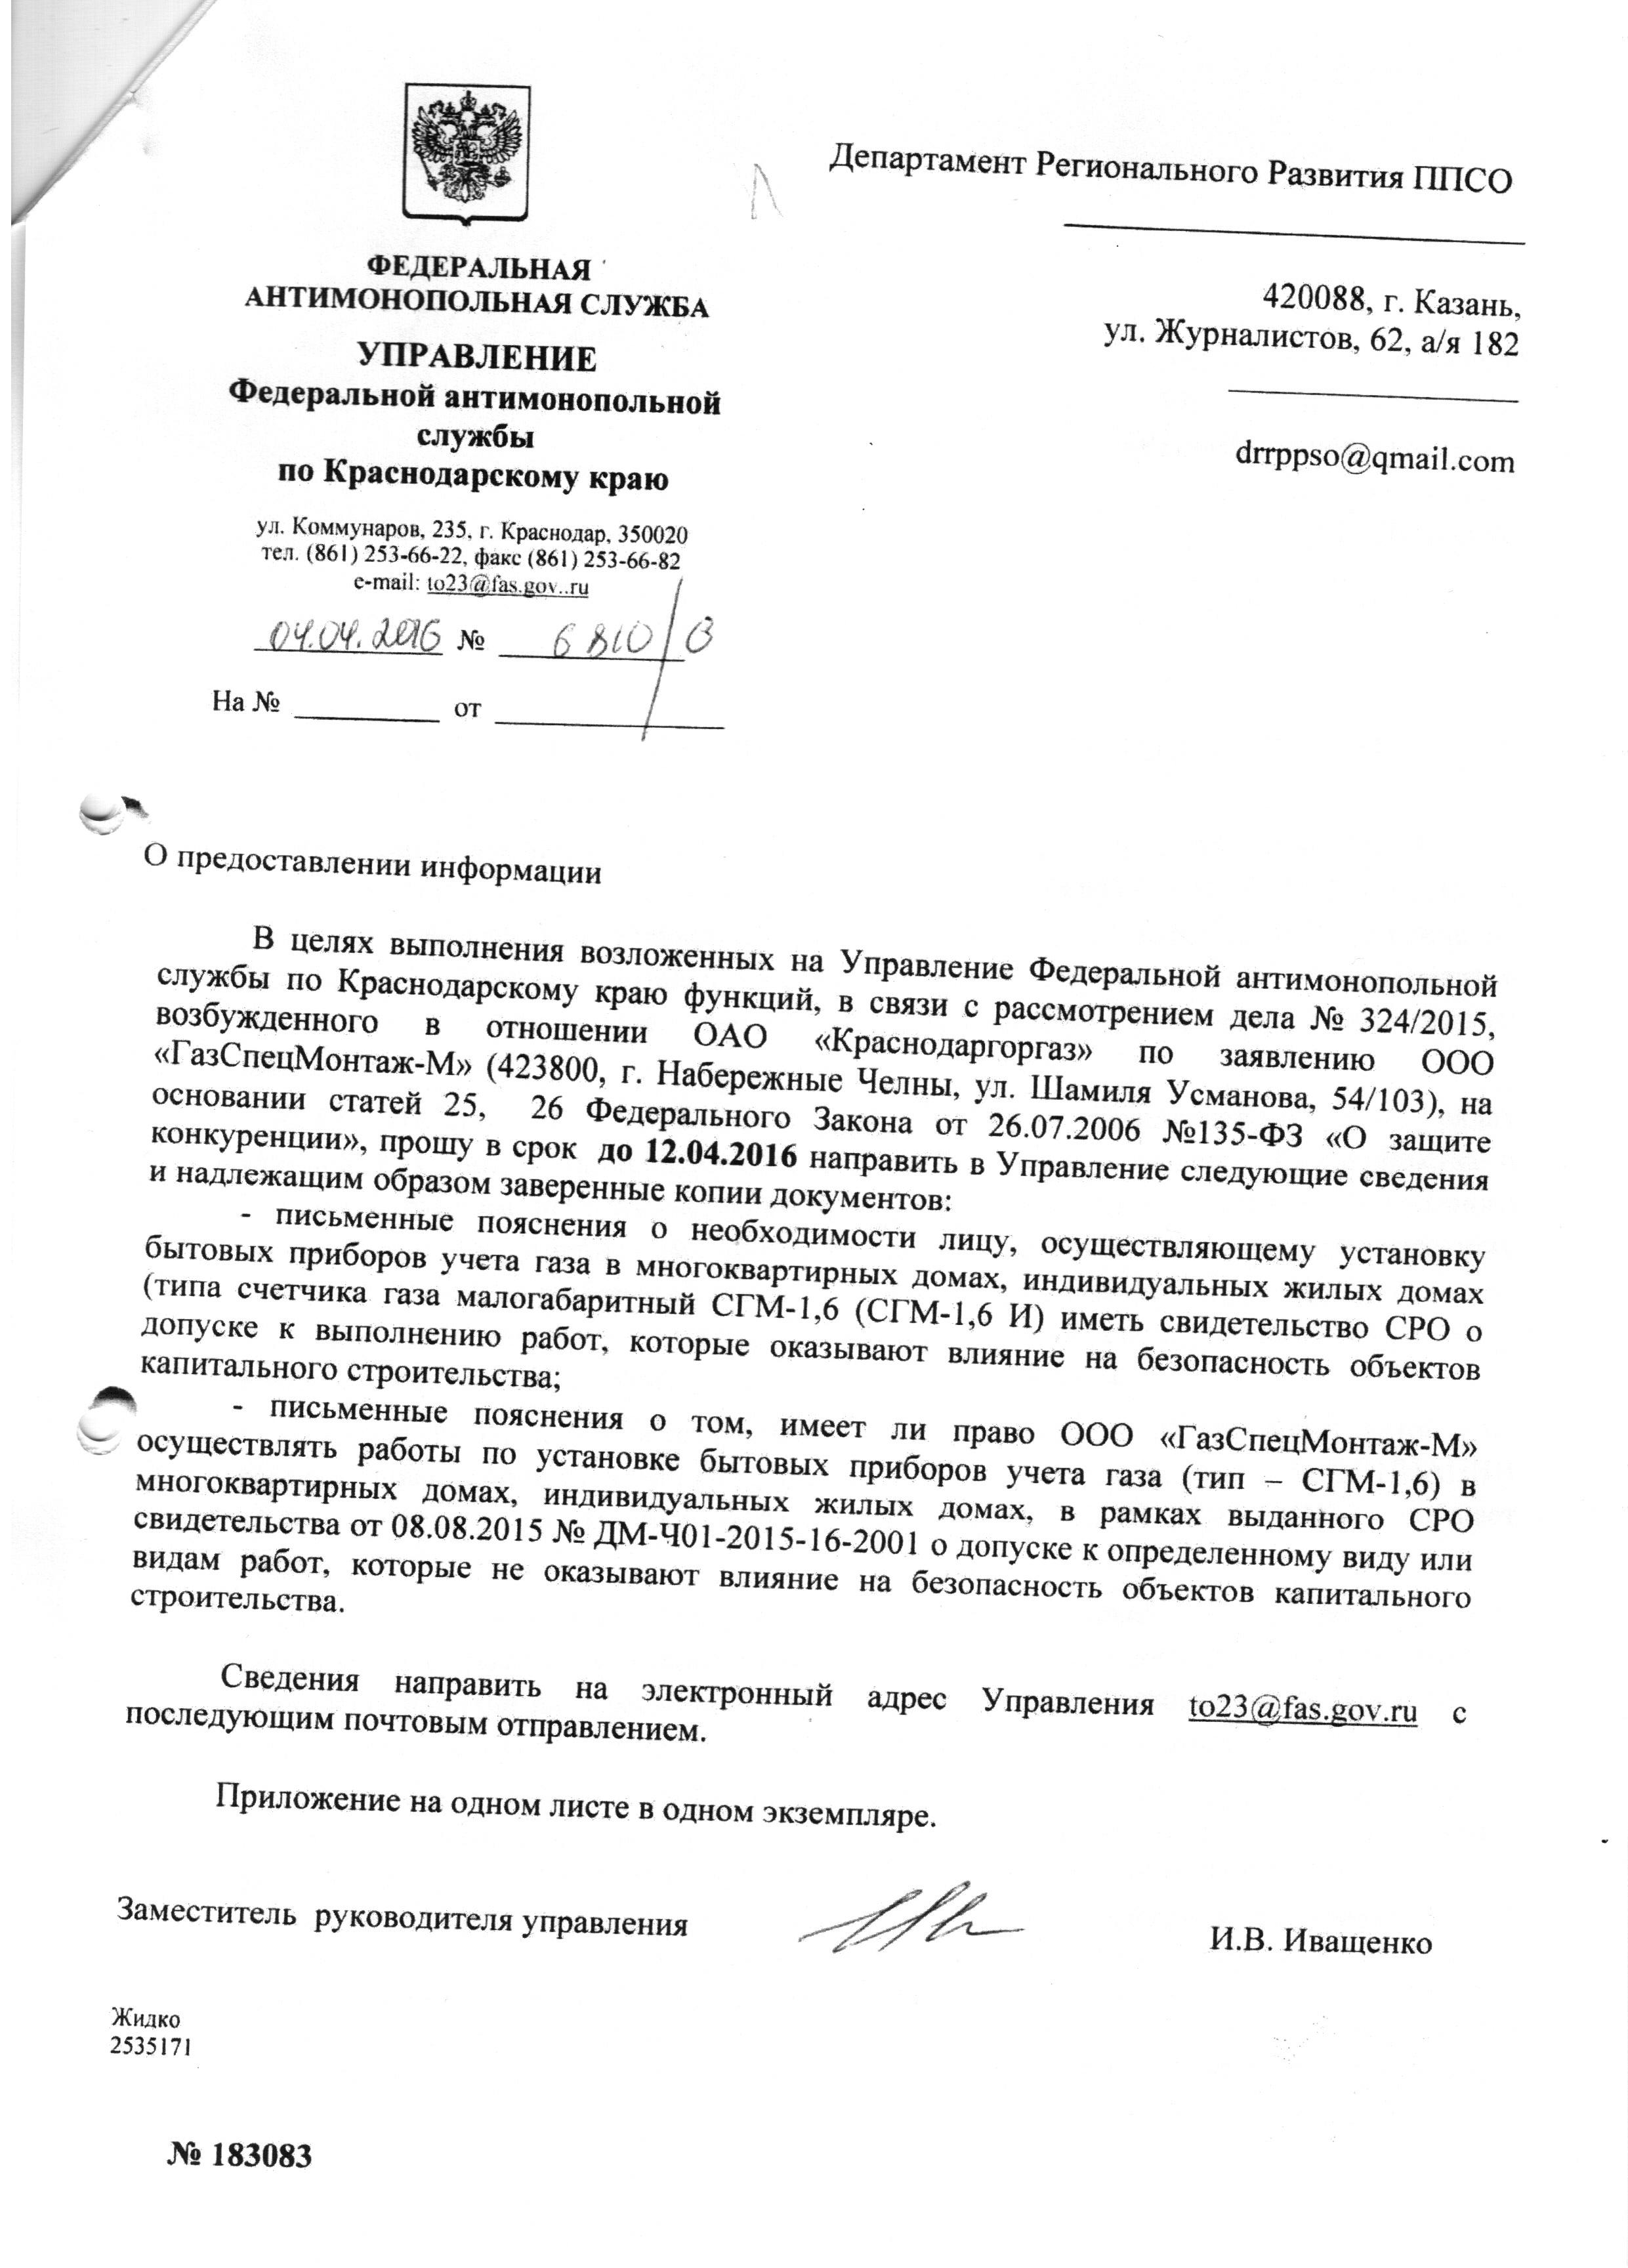 Запрос ФАС Краснодарского края